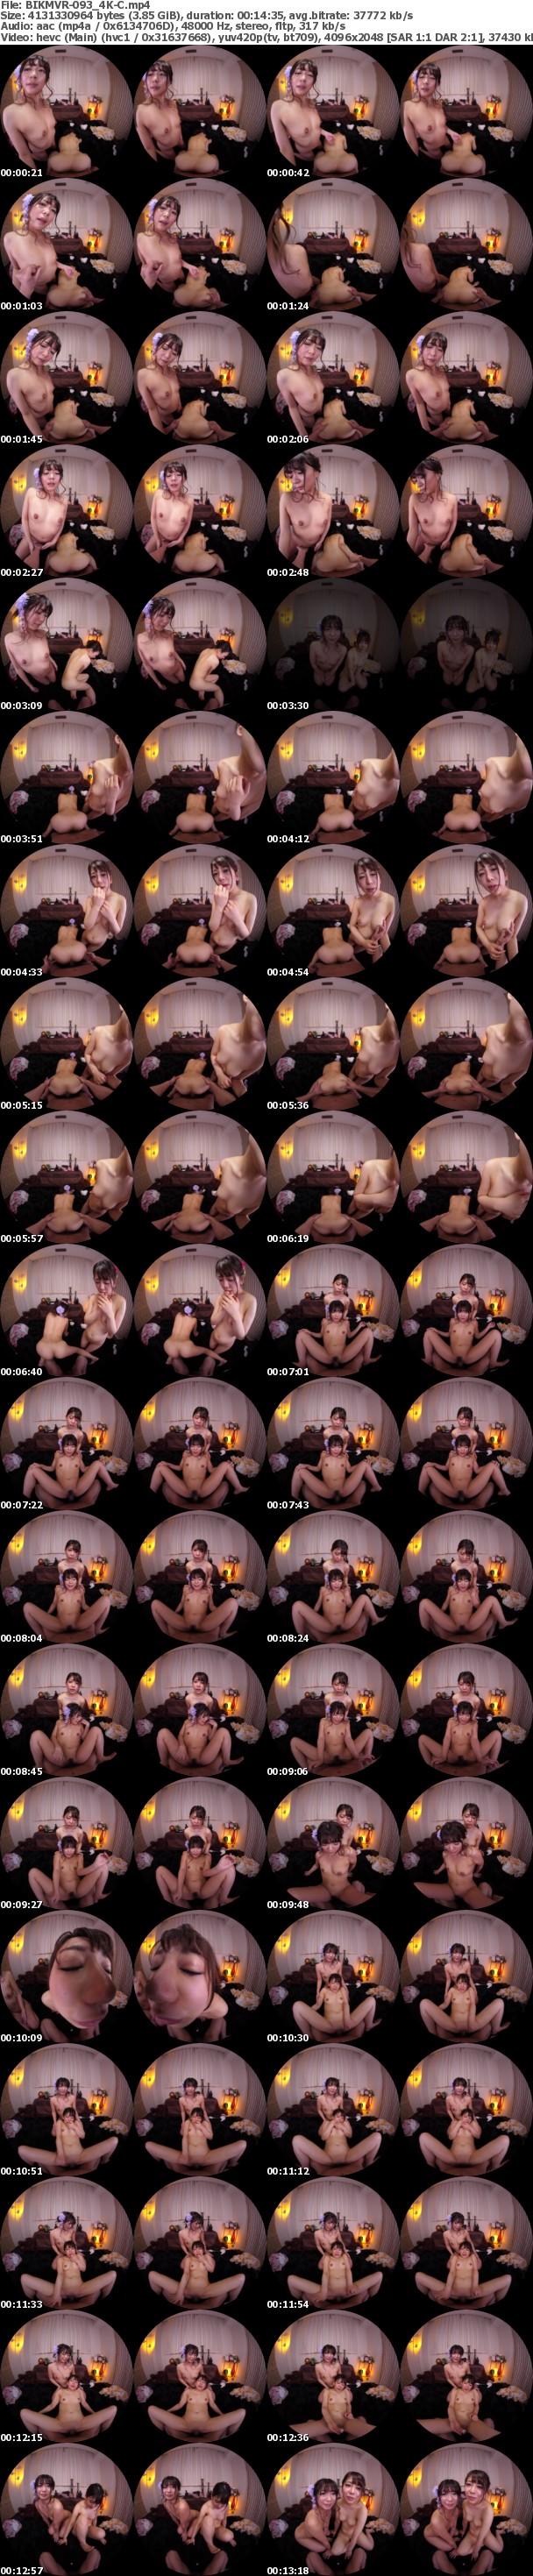 (VR) BIKMVR-093 【4K匠】【HQバイノーラル録音】都内某所の美少女高級耳かきマッサージ店 泉ひなの 有村のぞみ